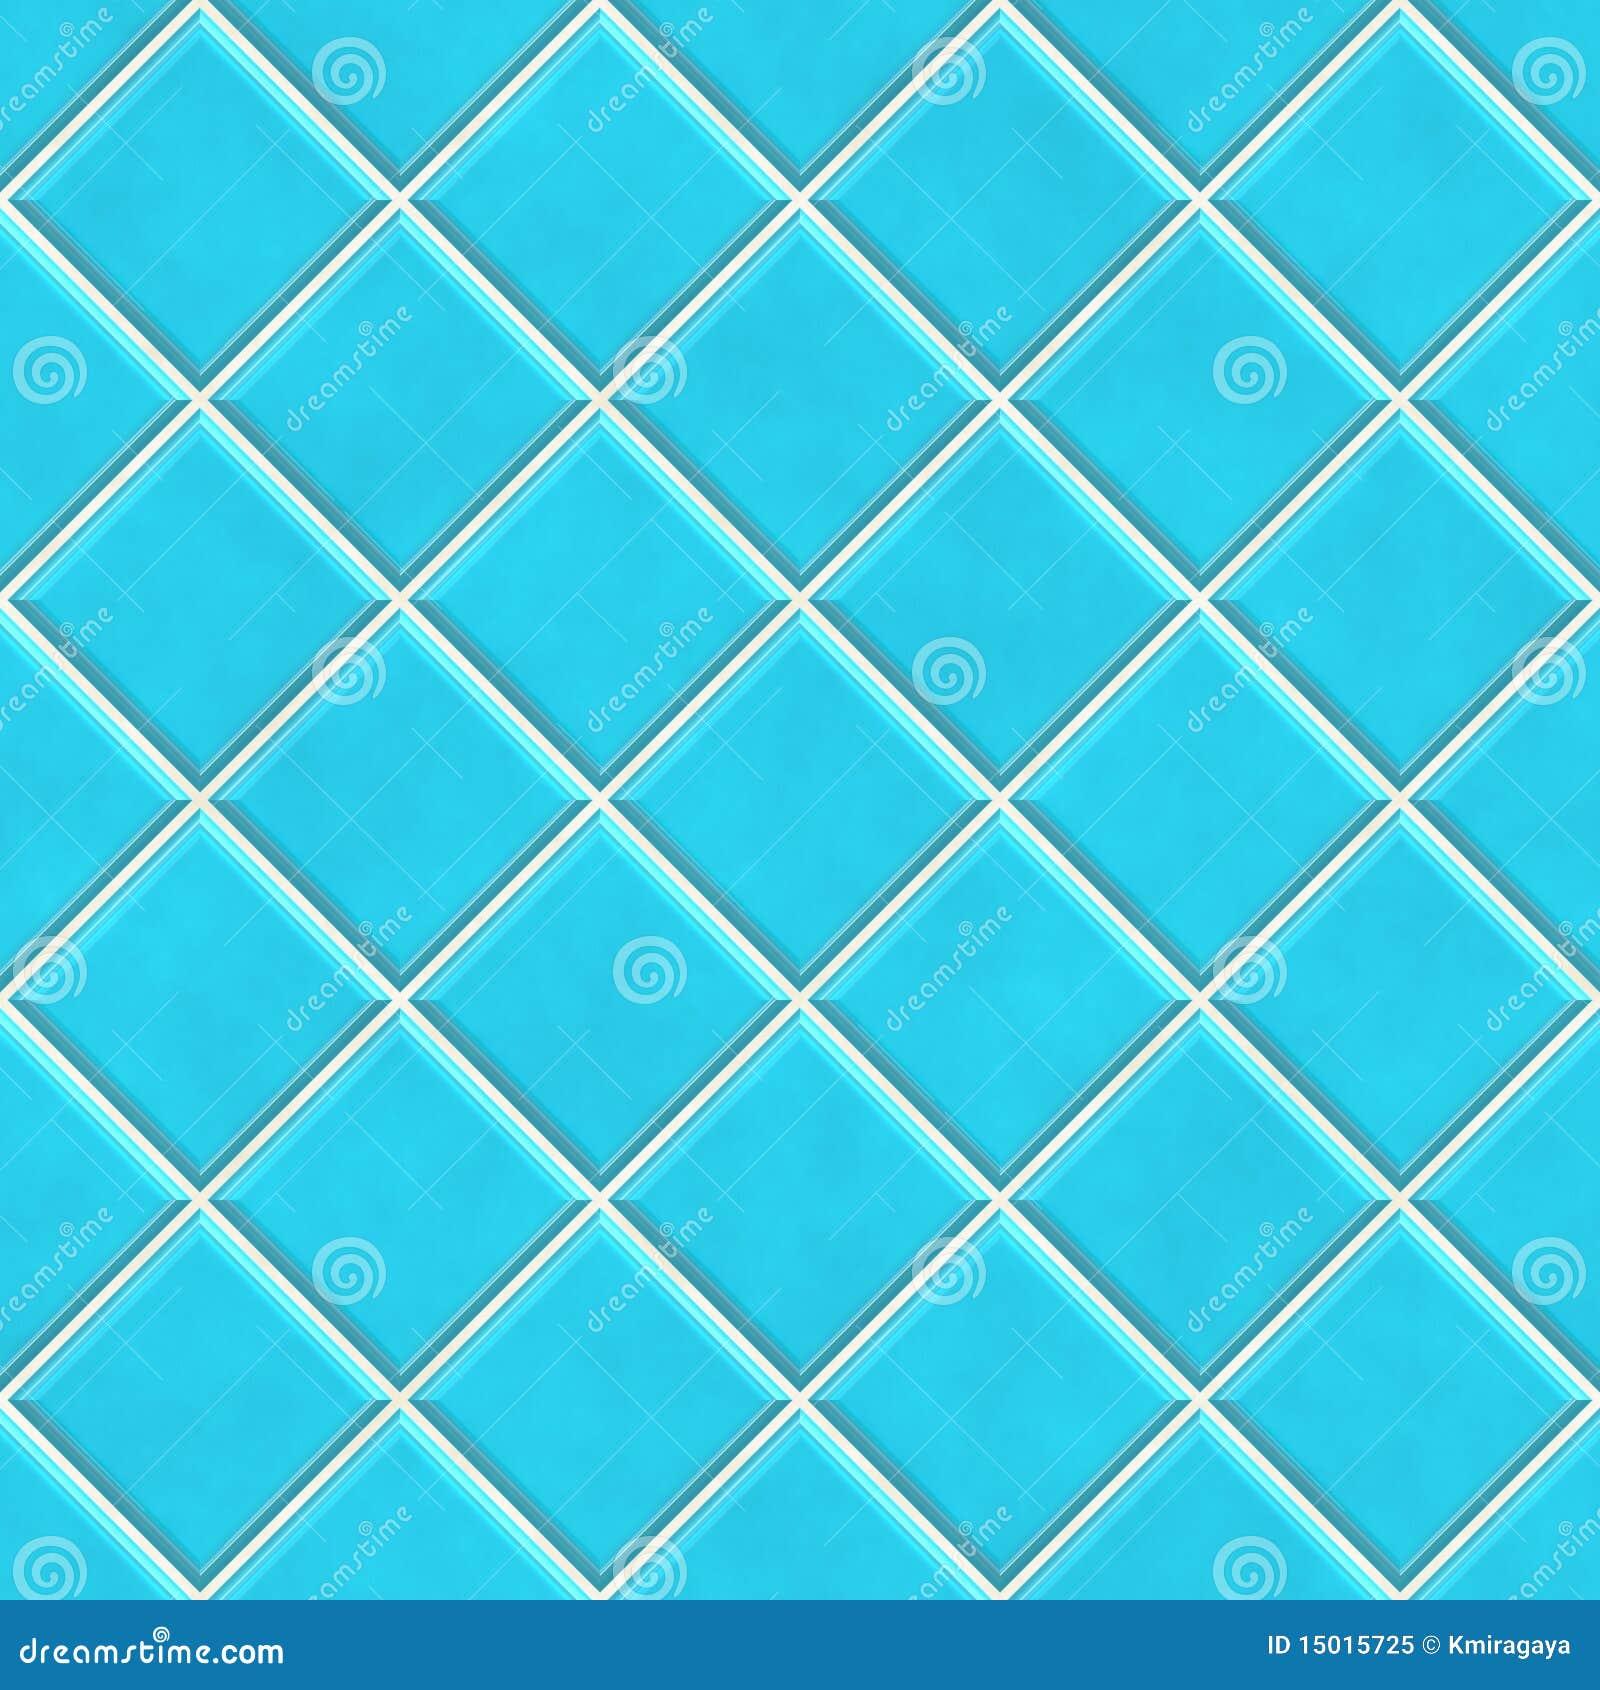 Blue bathroom tile texture viewing gallery